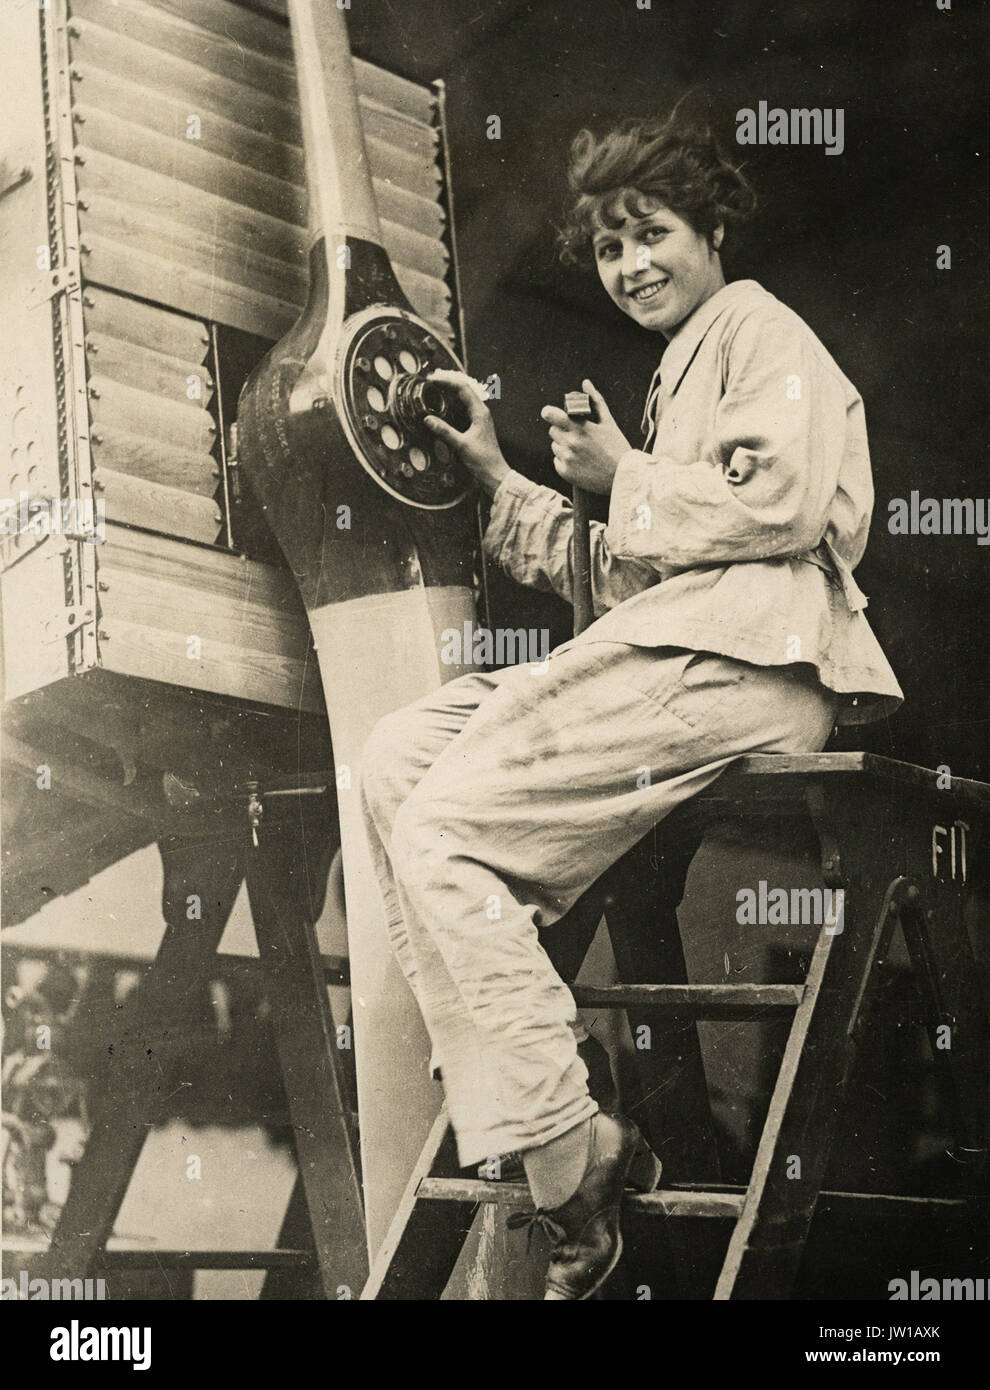 Mechanic - Alternative Title: Women's Work - Stock Image